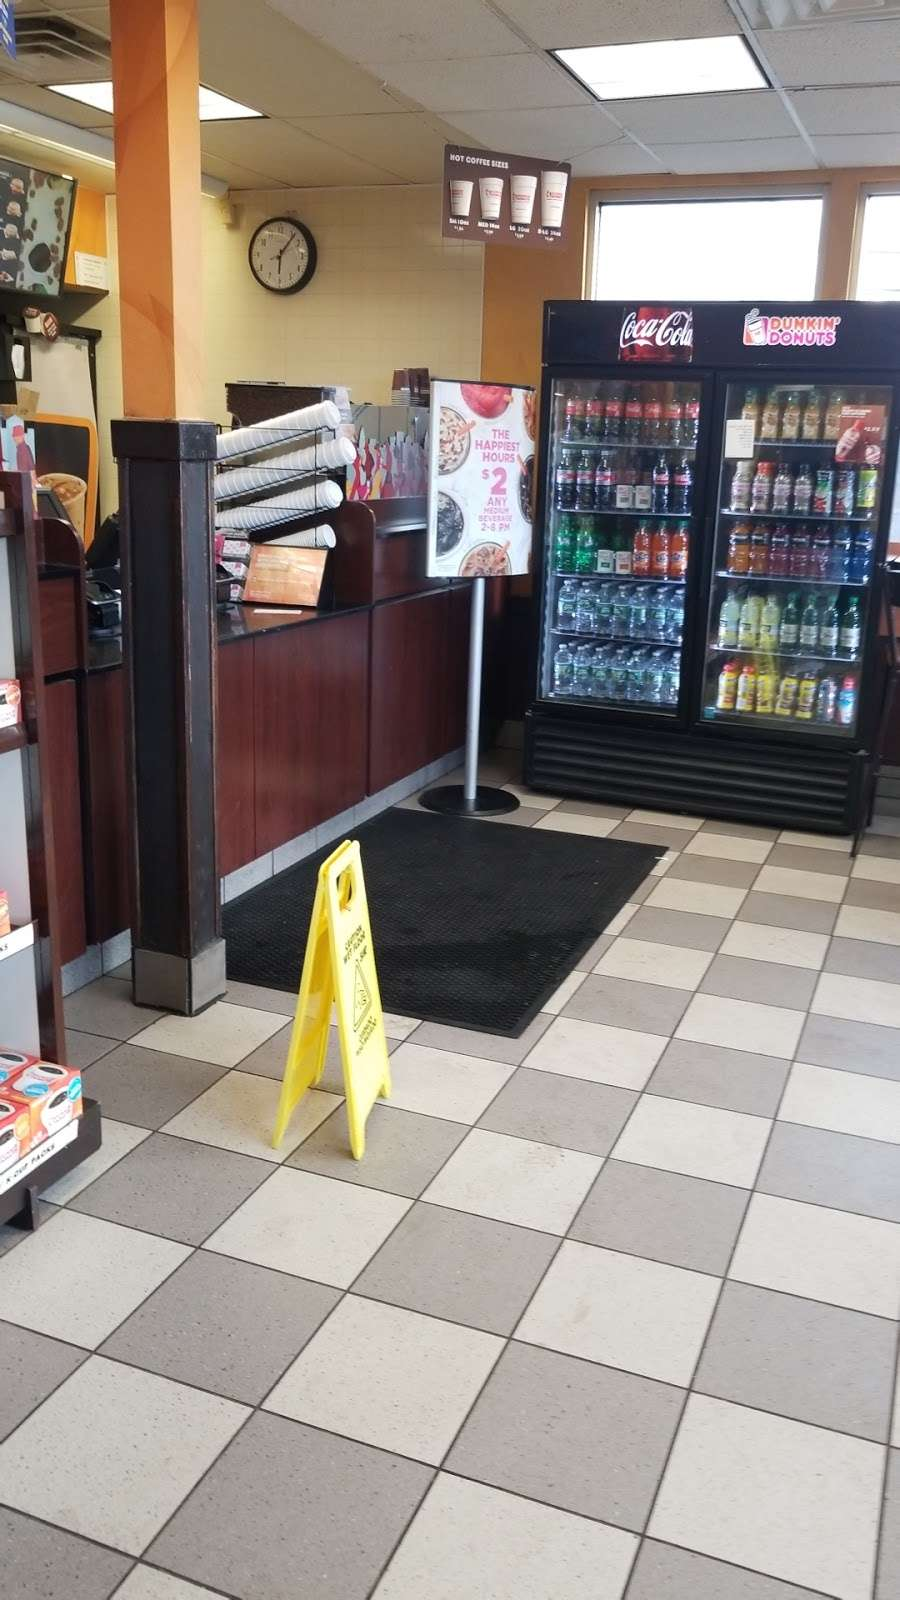 Dunkin Donuts - cafe  | Photo 9 of 10 | Address: 402 Grand St #436, Jersey City, NJ 07302, USA | Phone: (201) 309-0777